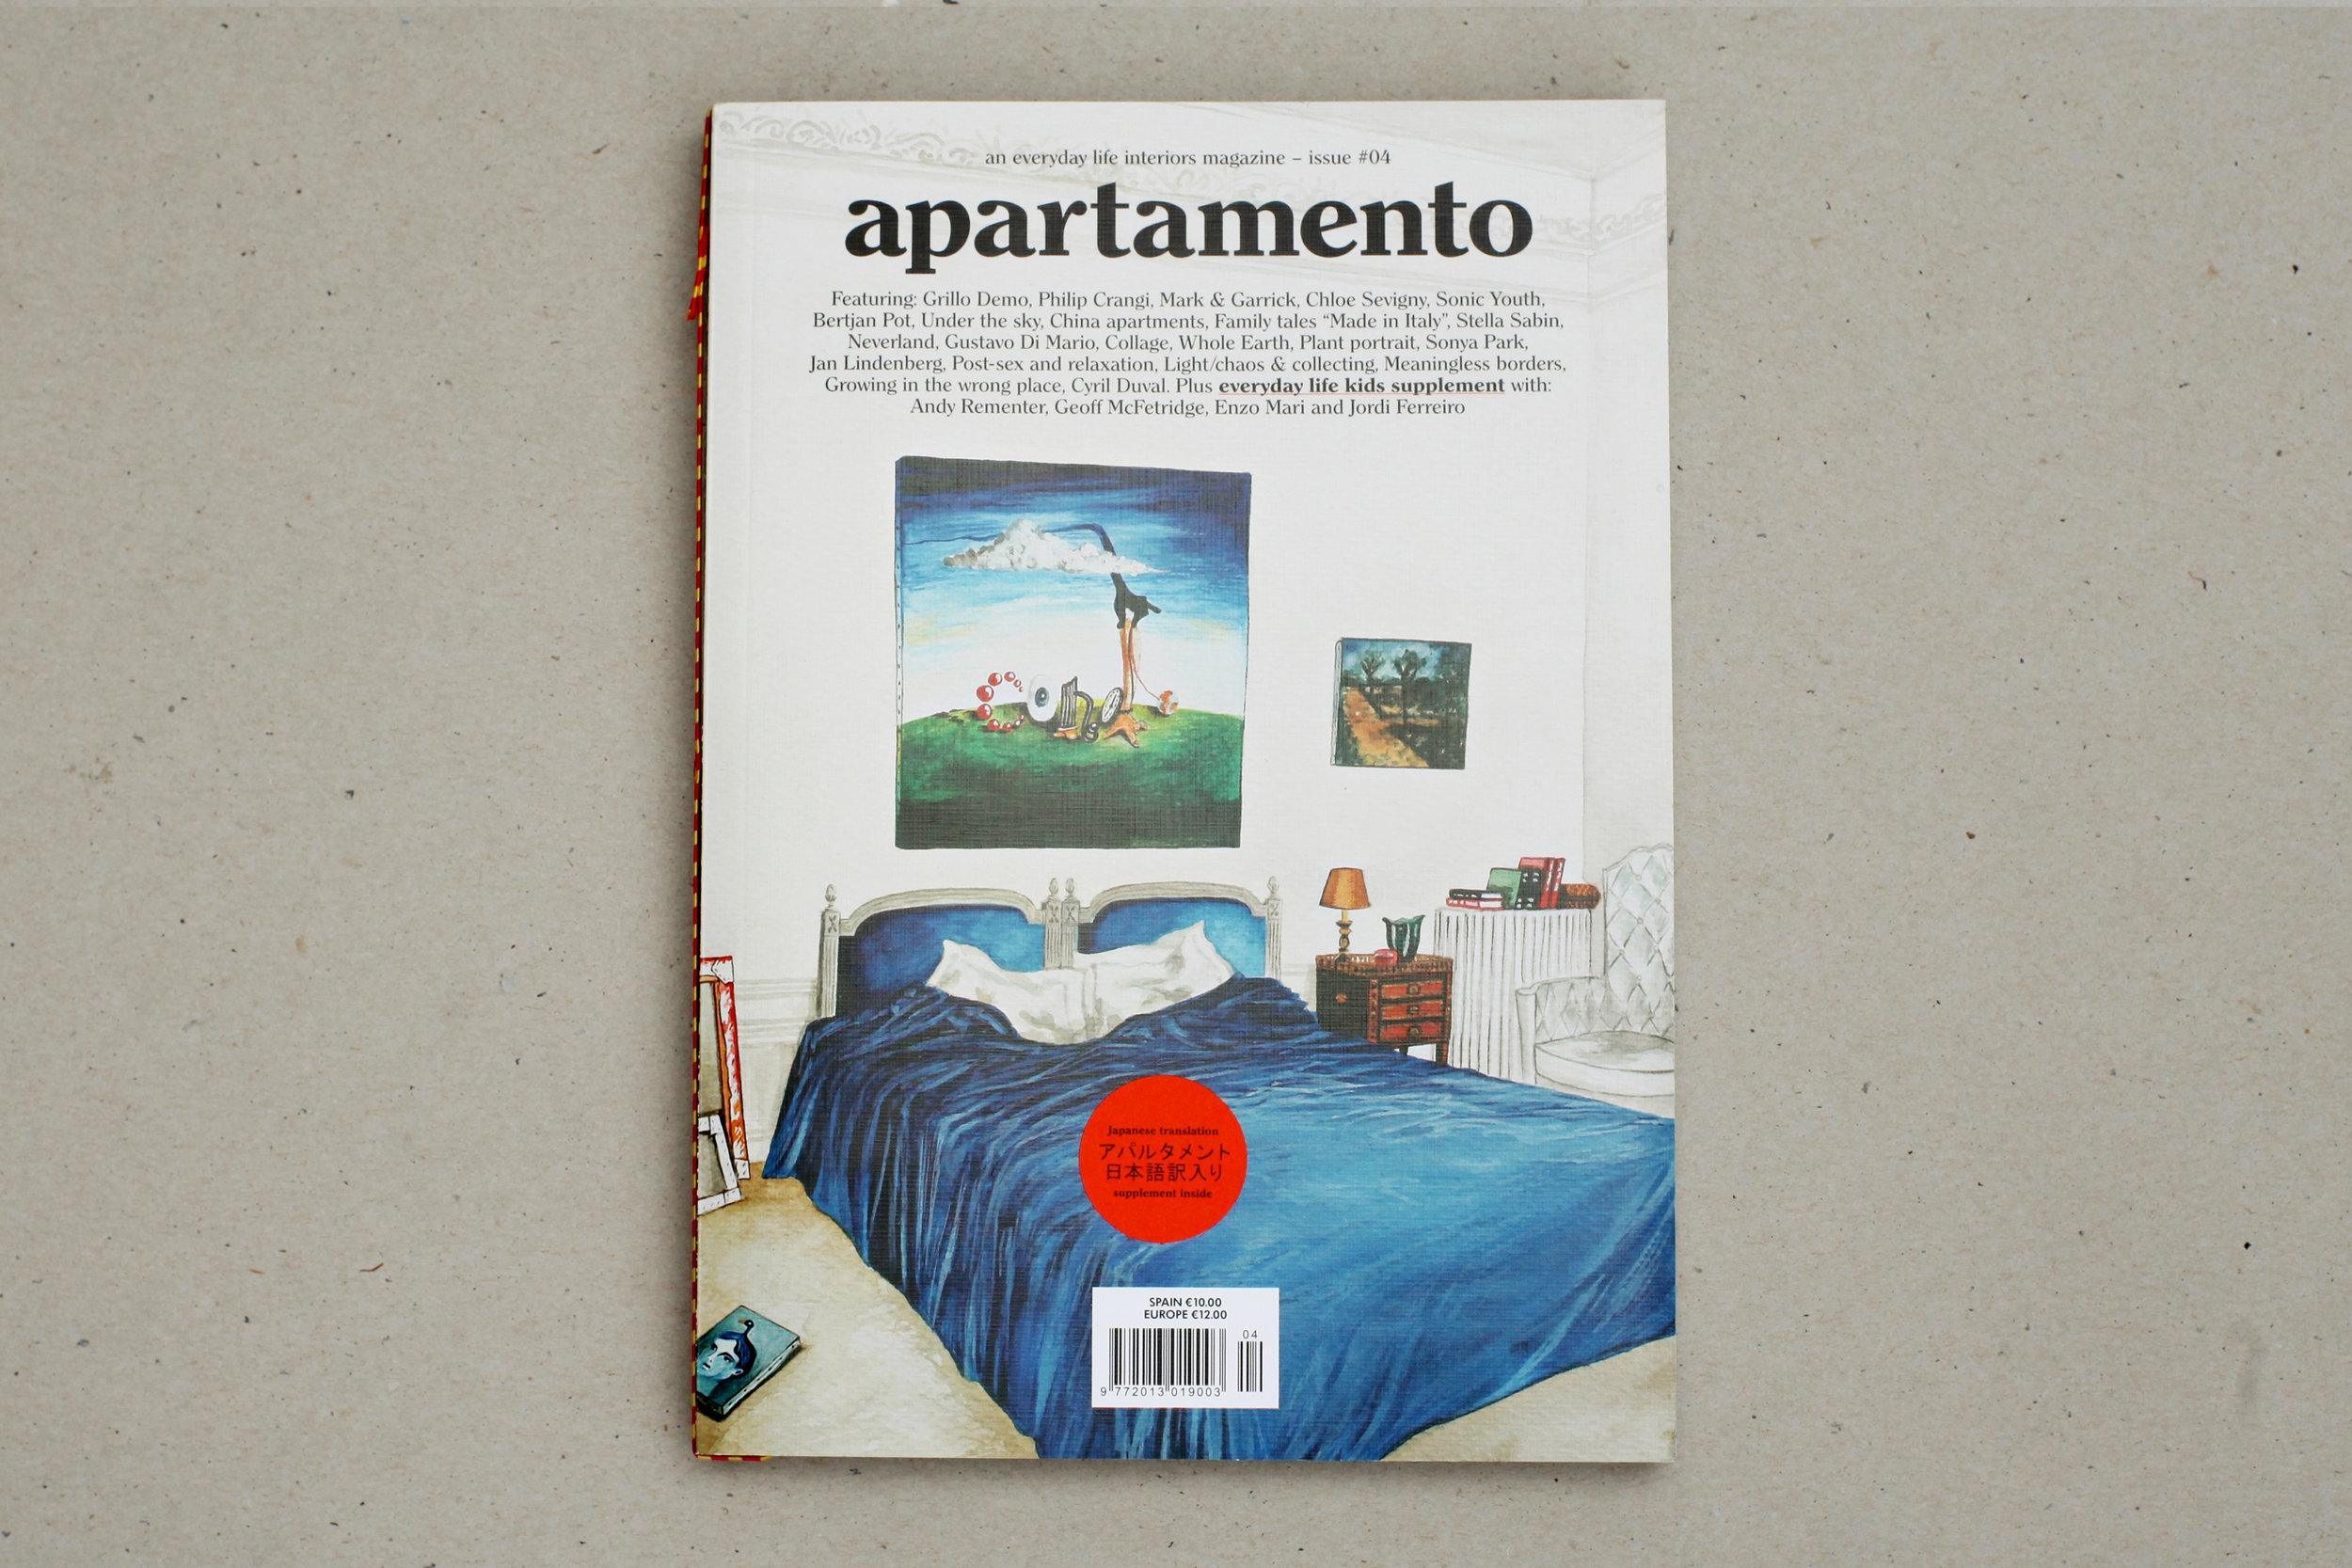 omar-sosa-apartamento-the-laterals-8.jpg